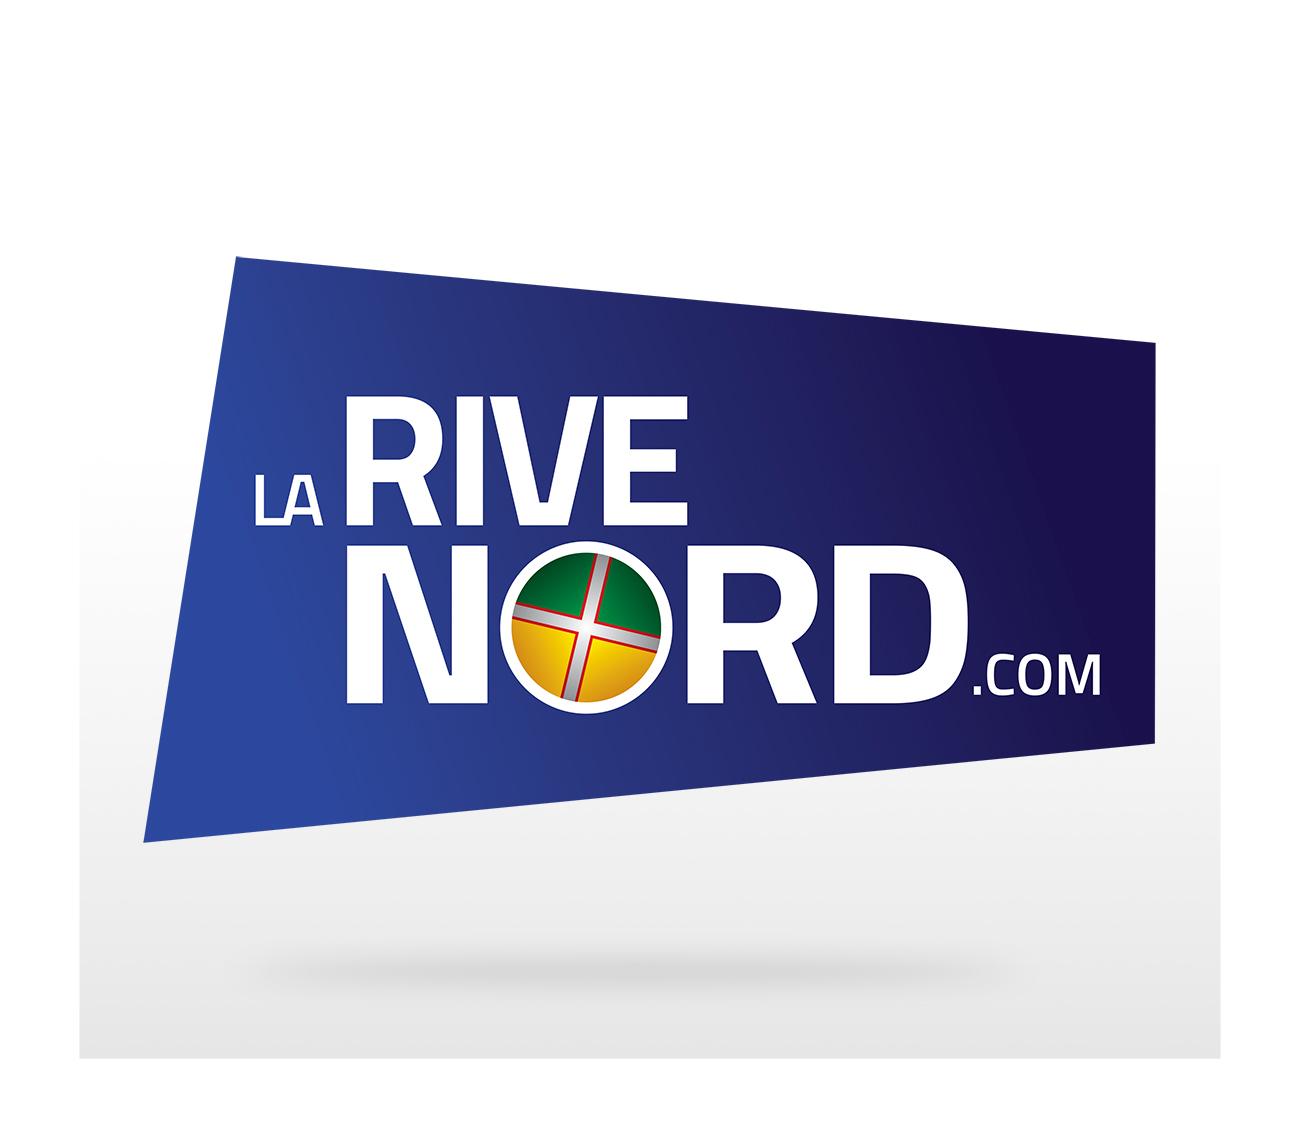 logo_larivenord